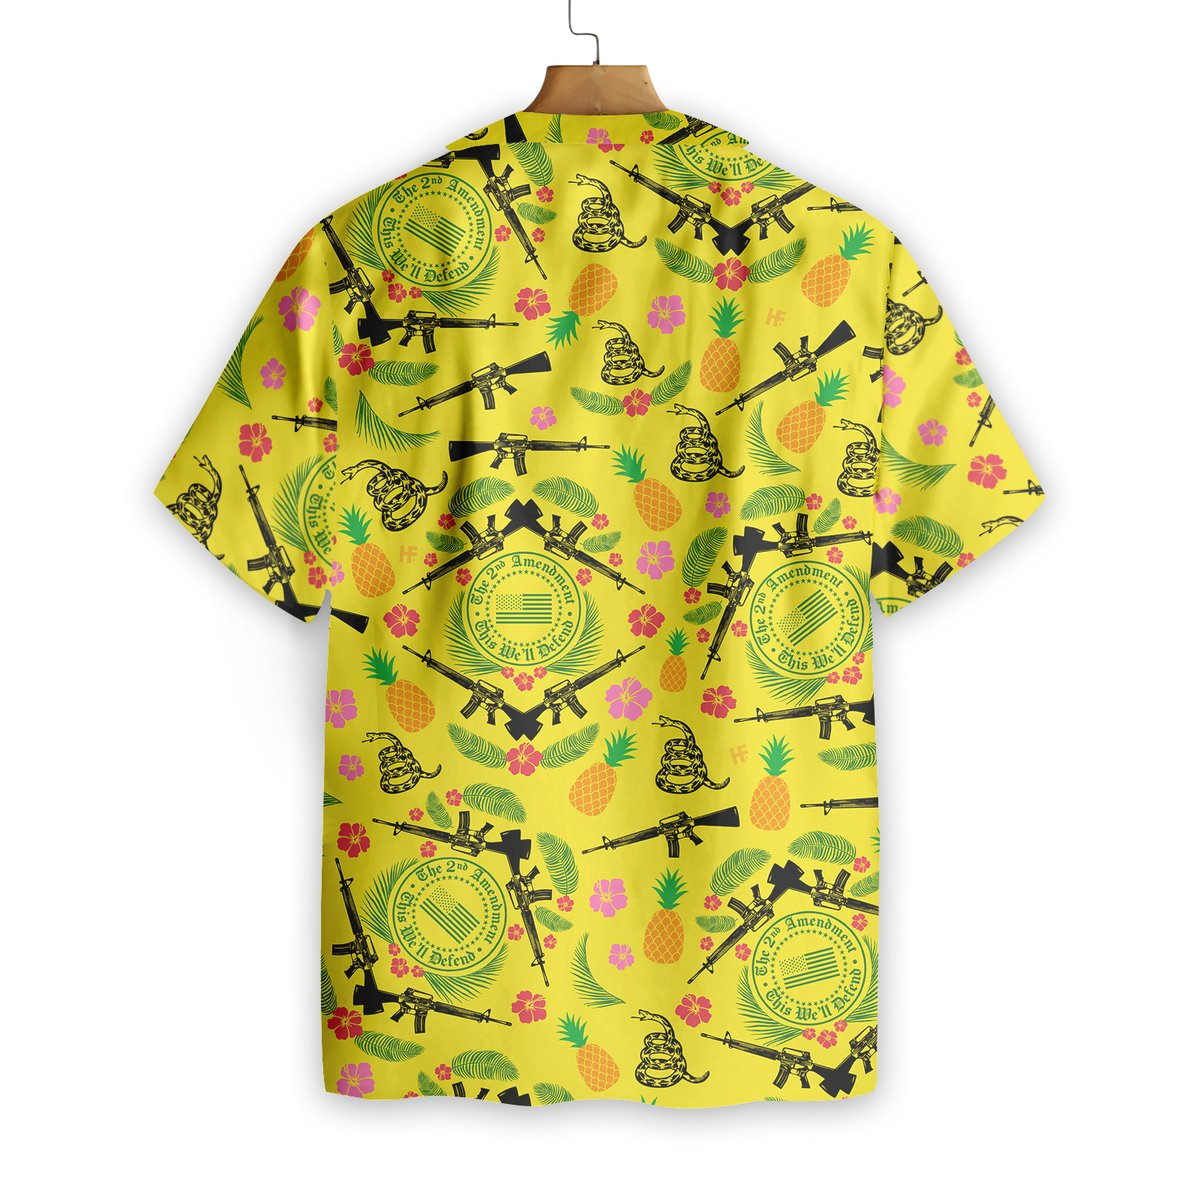 Gun 2nd Amendment Hawaiian Shirt1